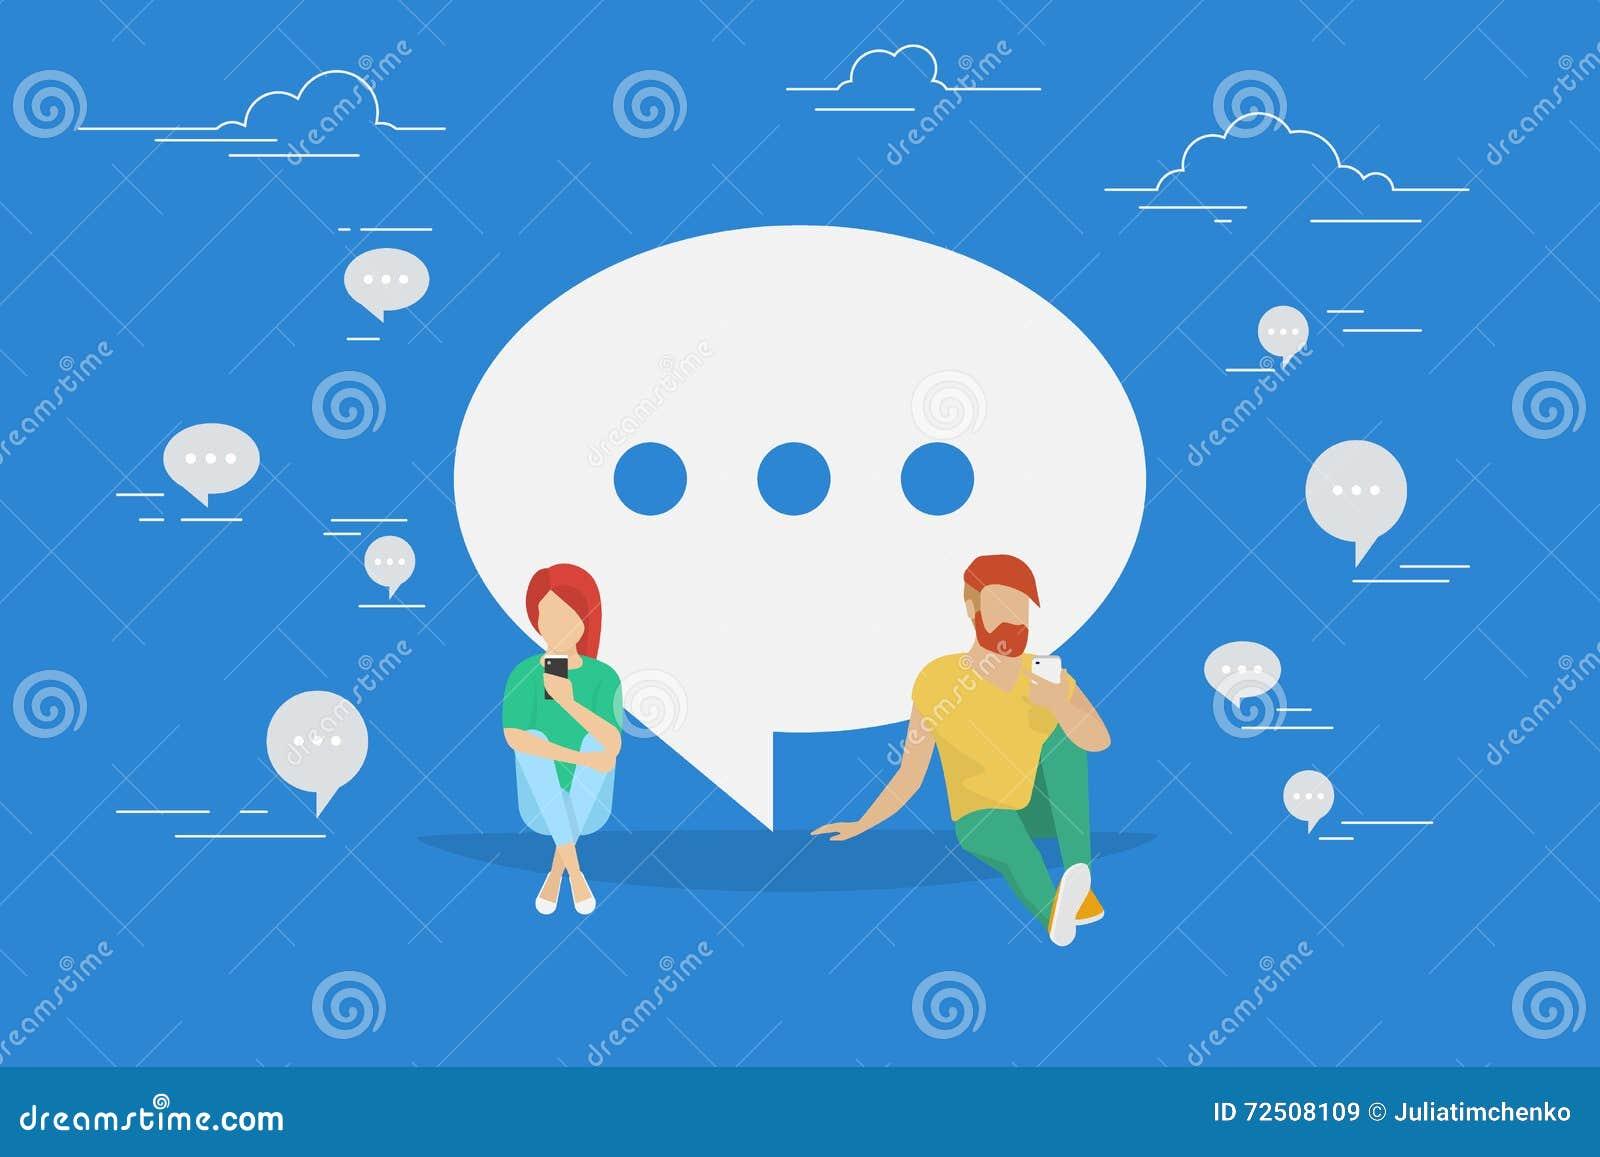 Chat Talk Concept Illustration Stock Vector